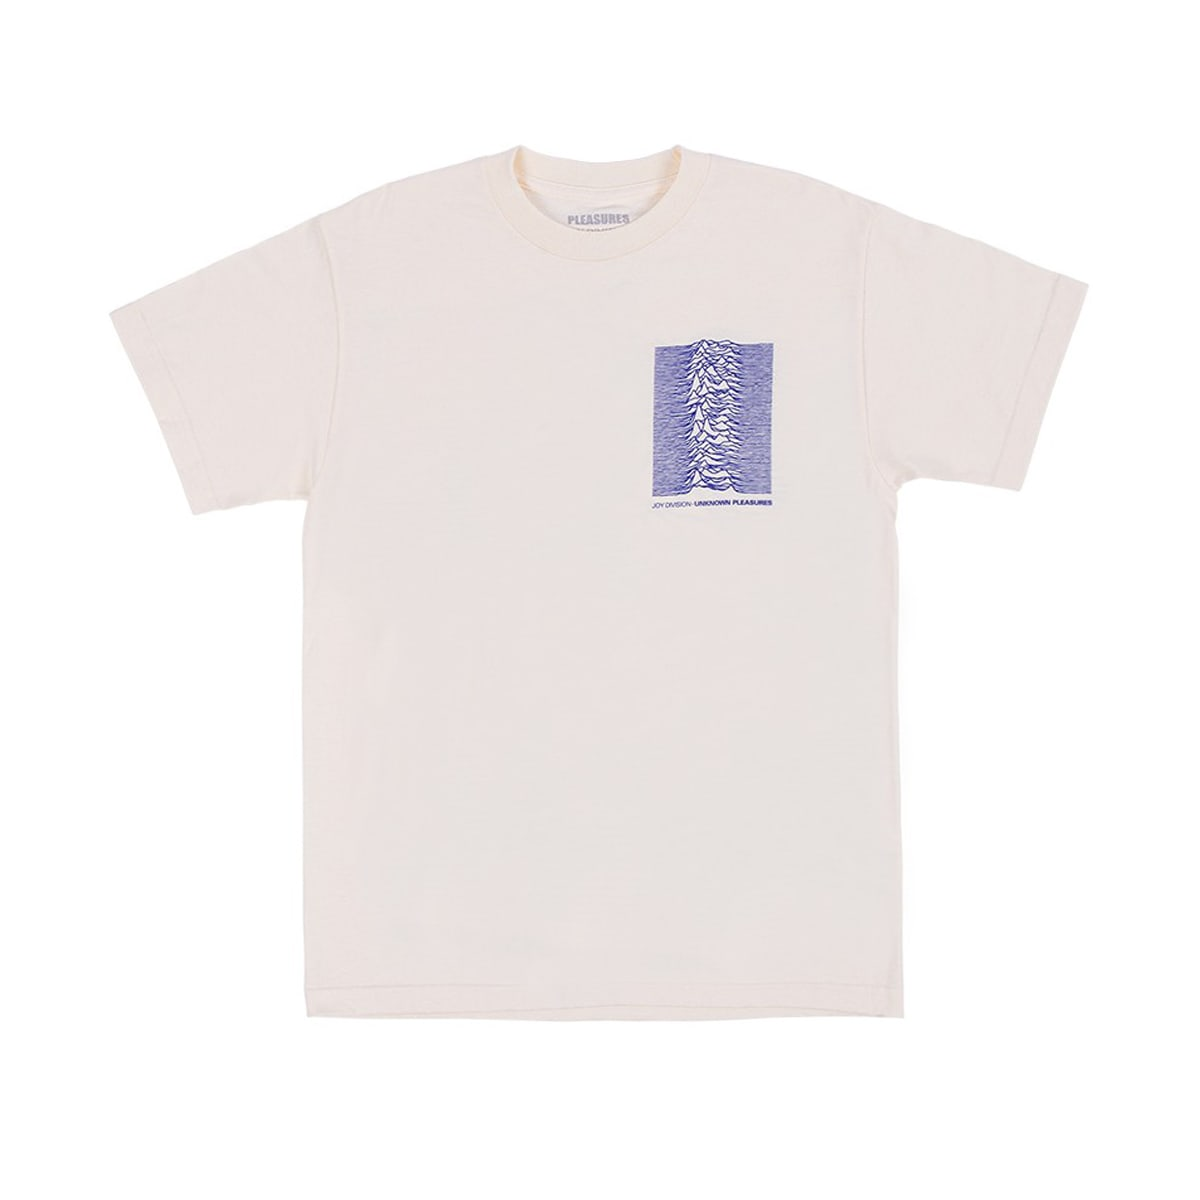 Pleasures Up T-shirt